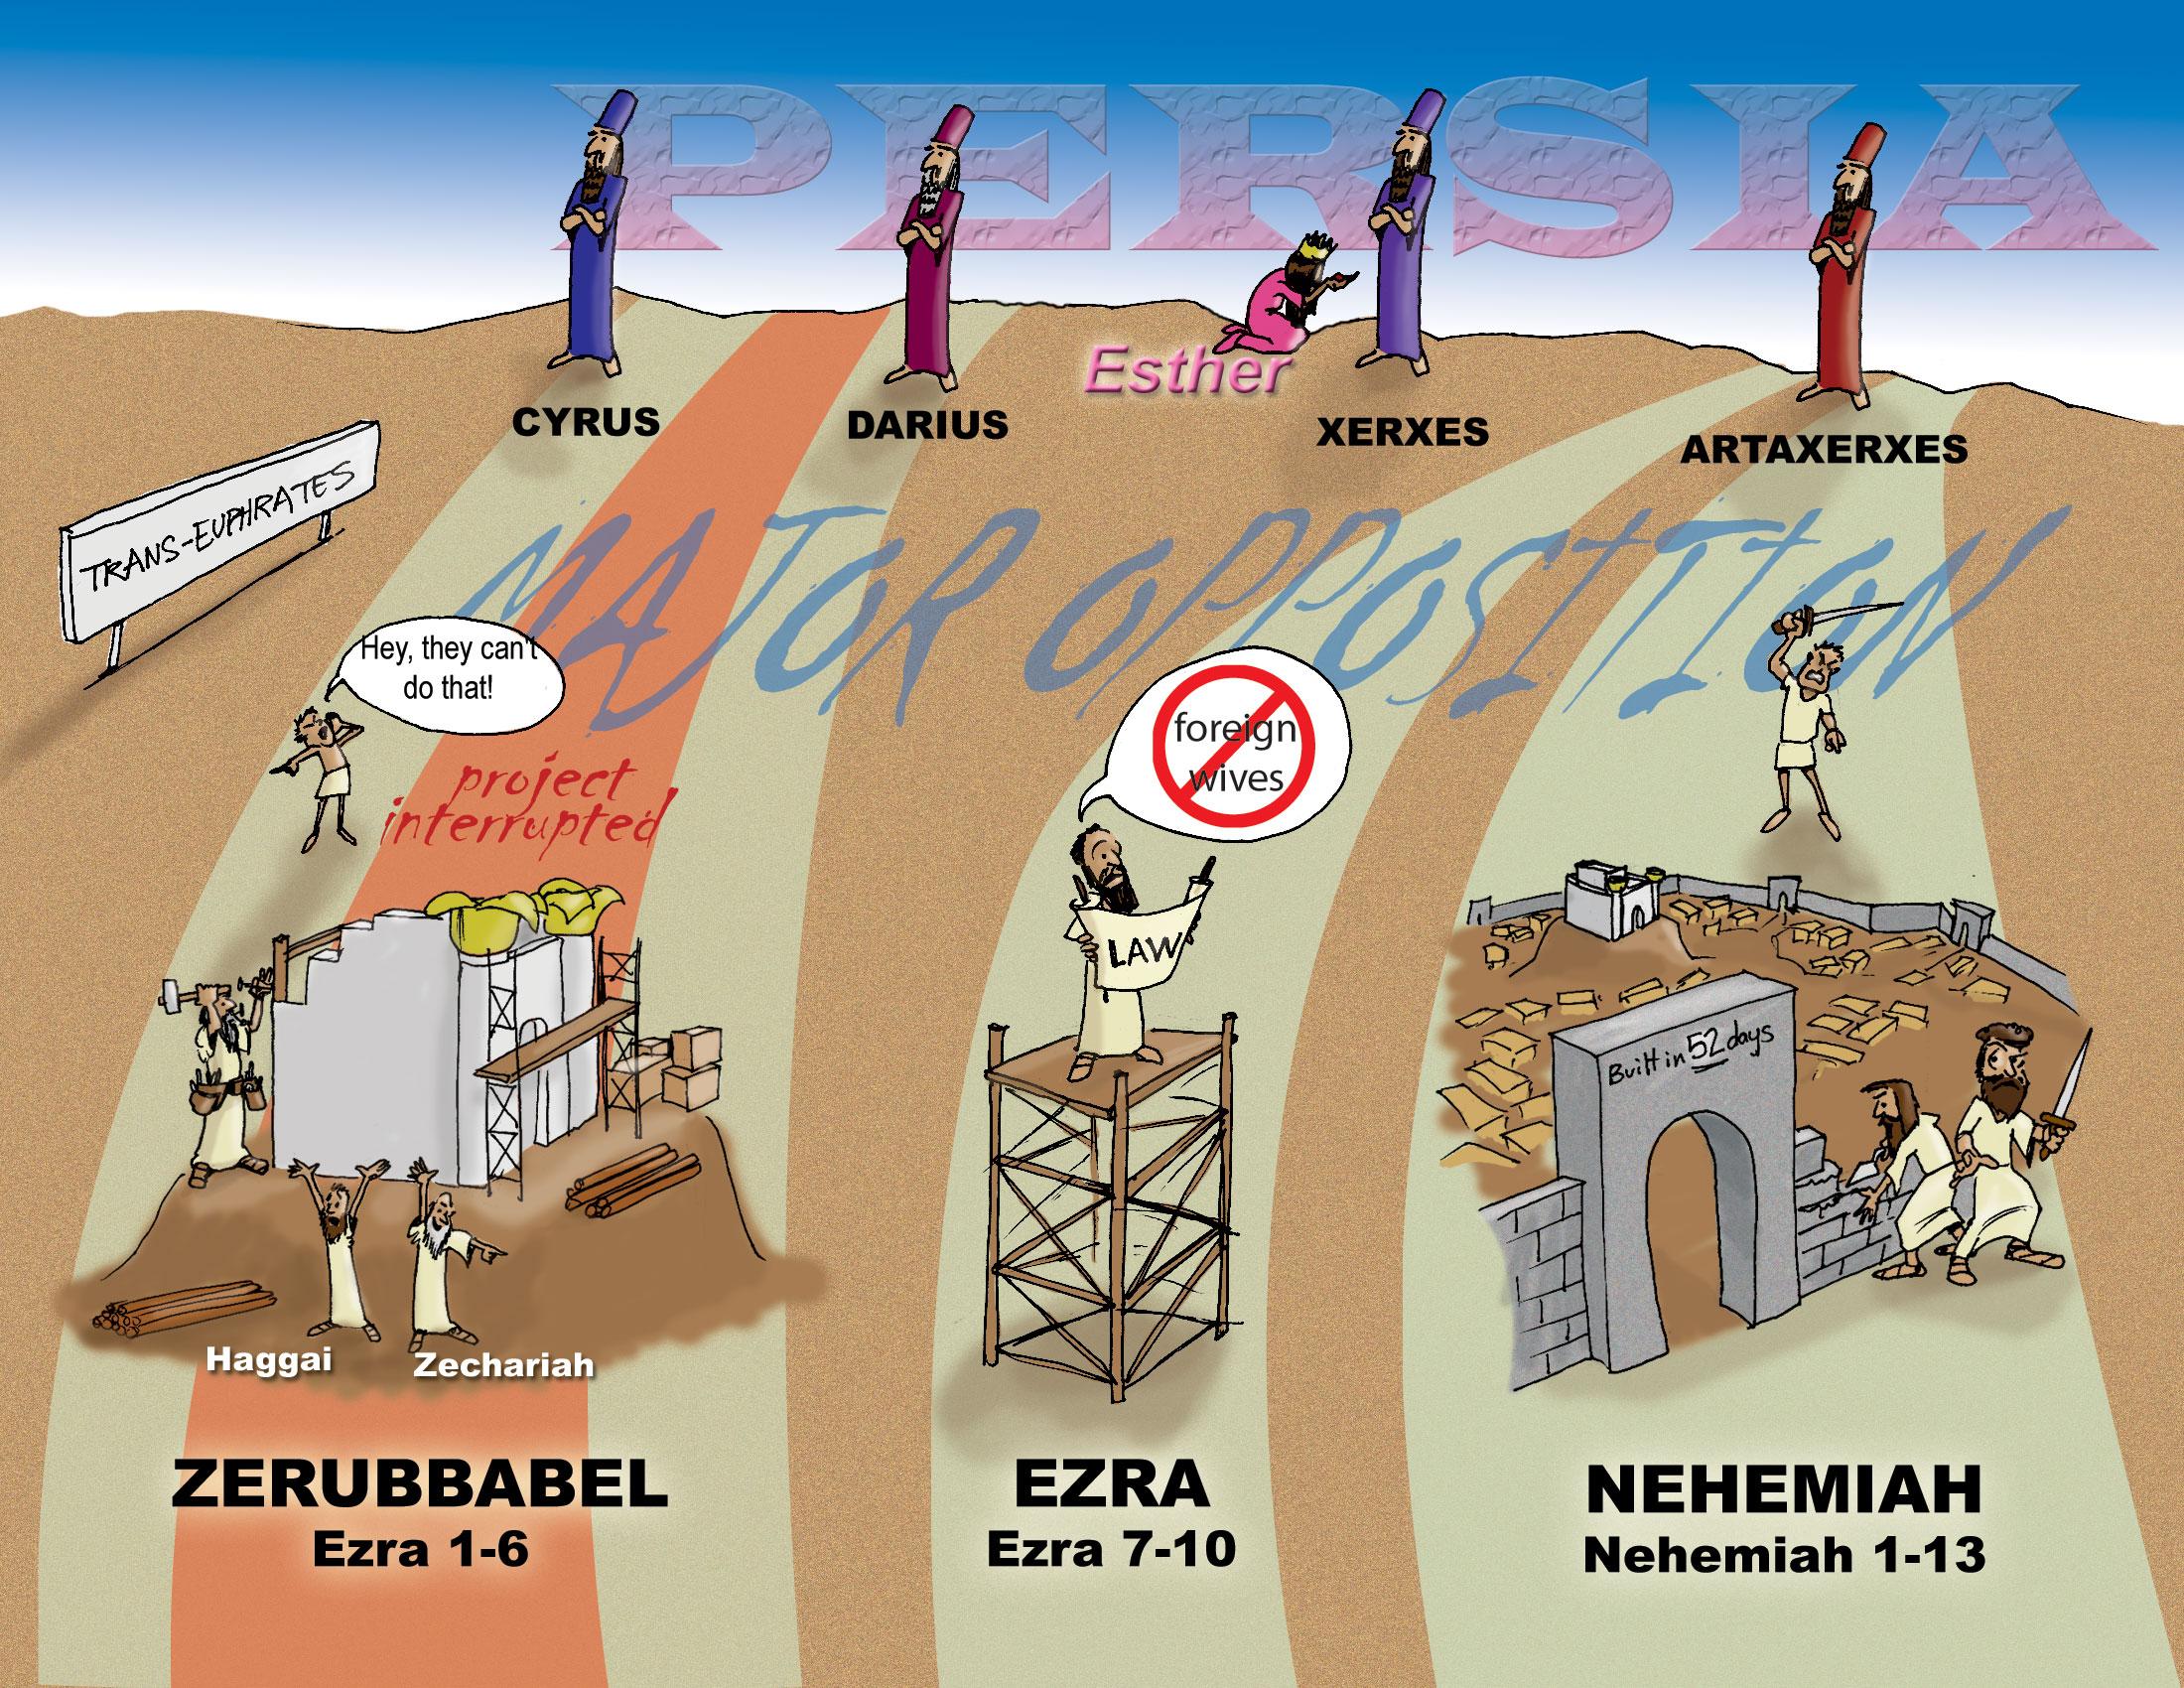 Ezra_Nehemiah